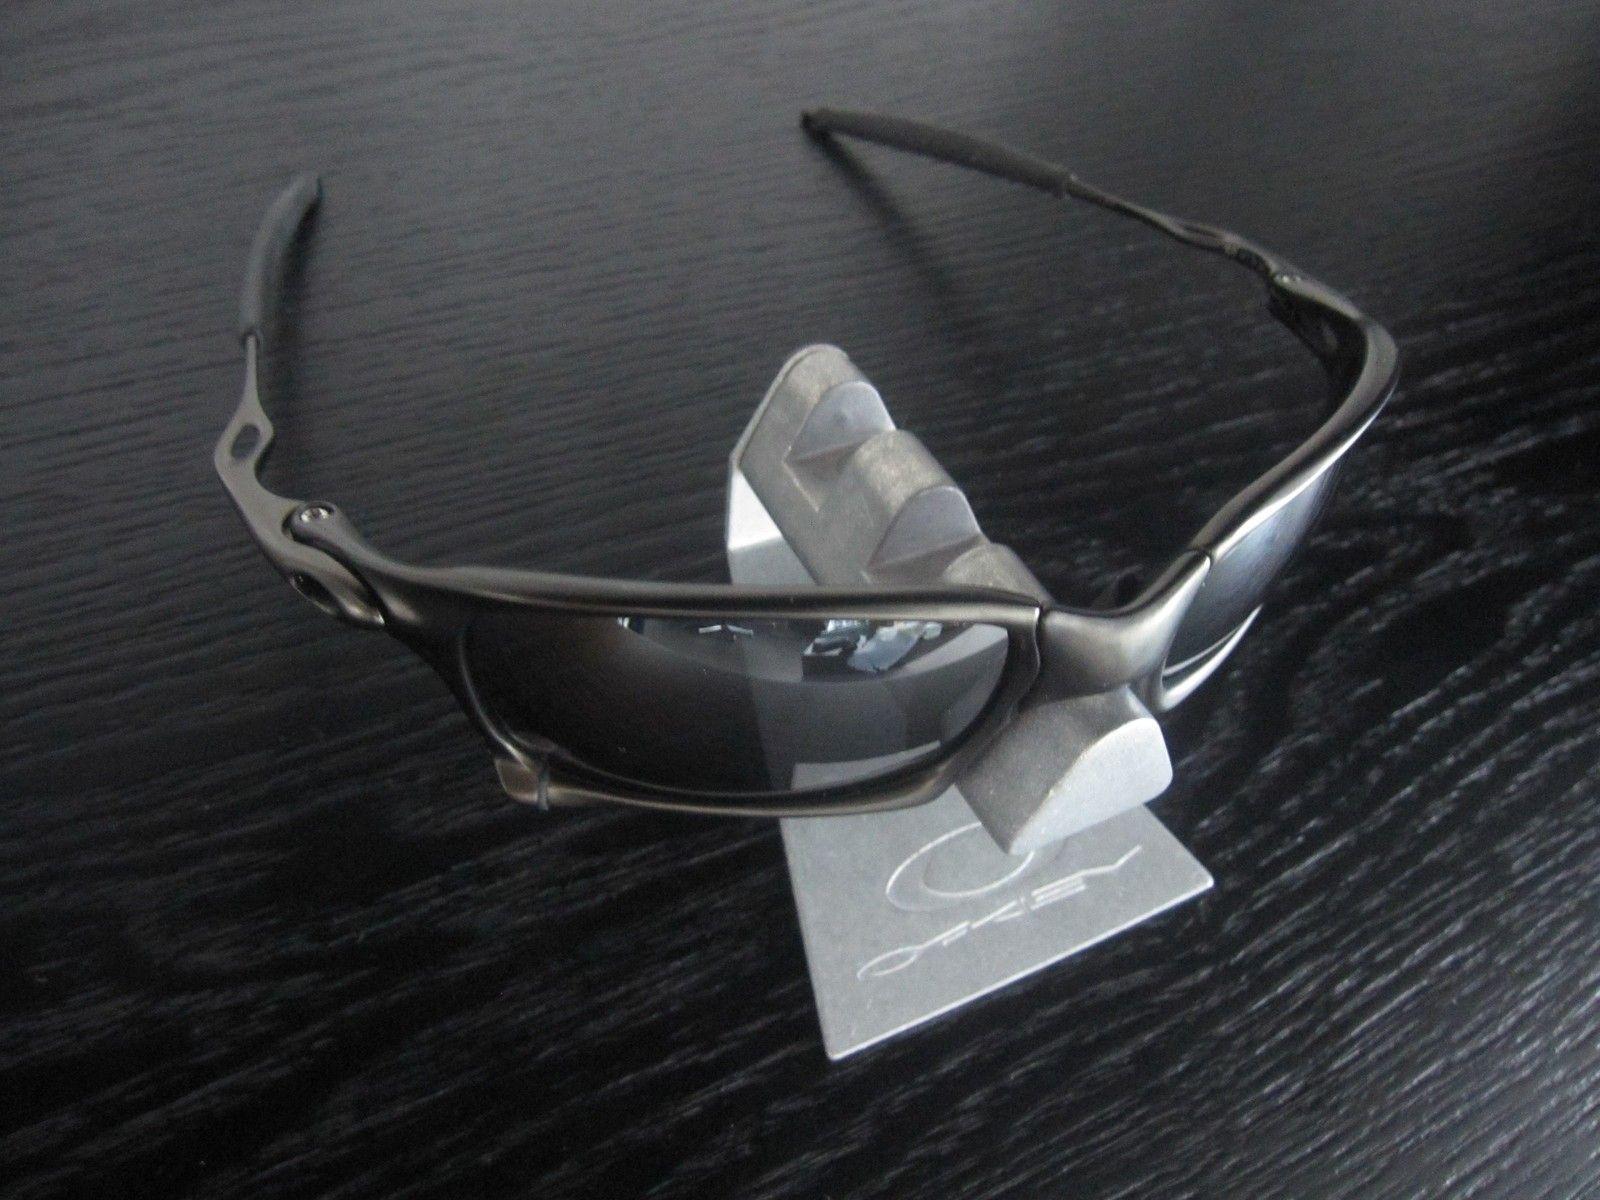 XS Carbon/BI 6011-01 - SOLD - IMG_2087.JPG